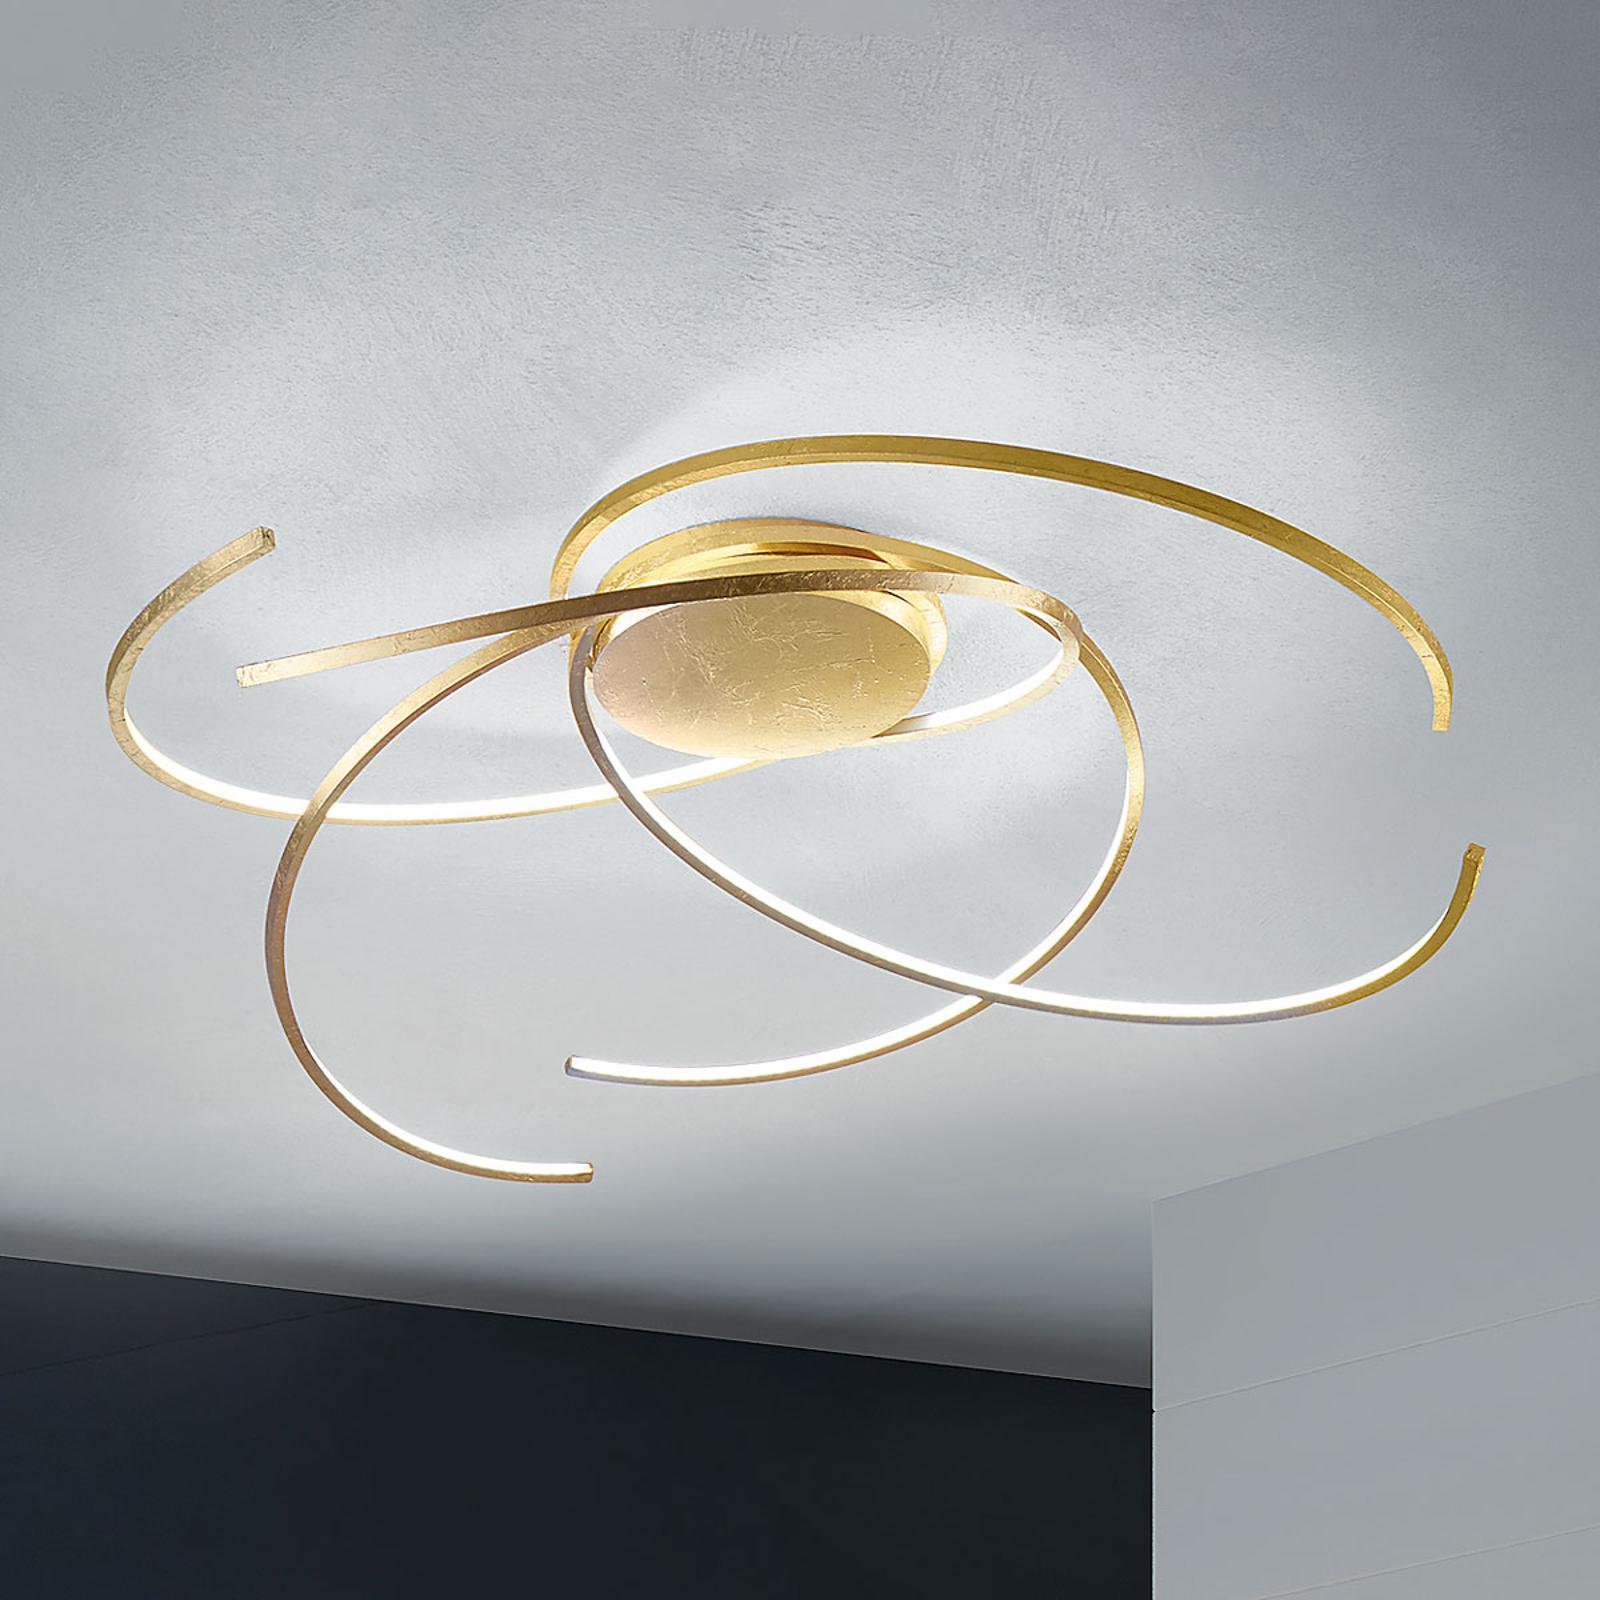 Escale Space - LED-kattovalaisin 80 cm, lehtikulta